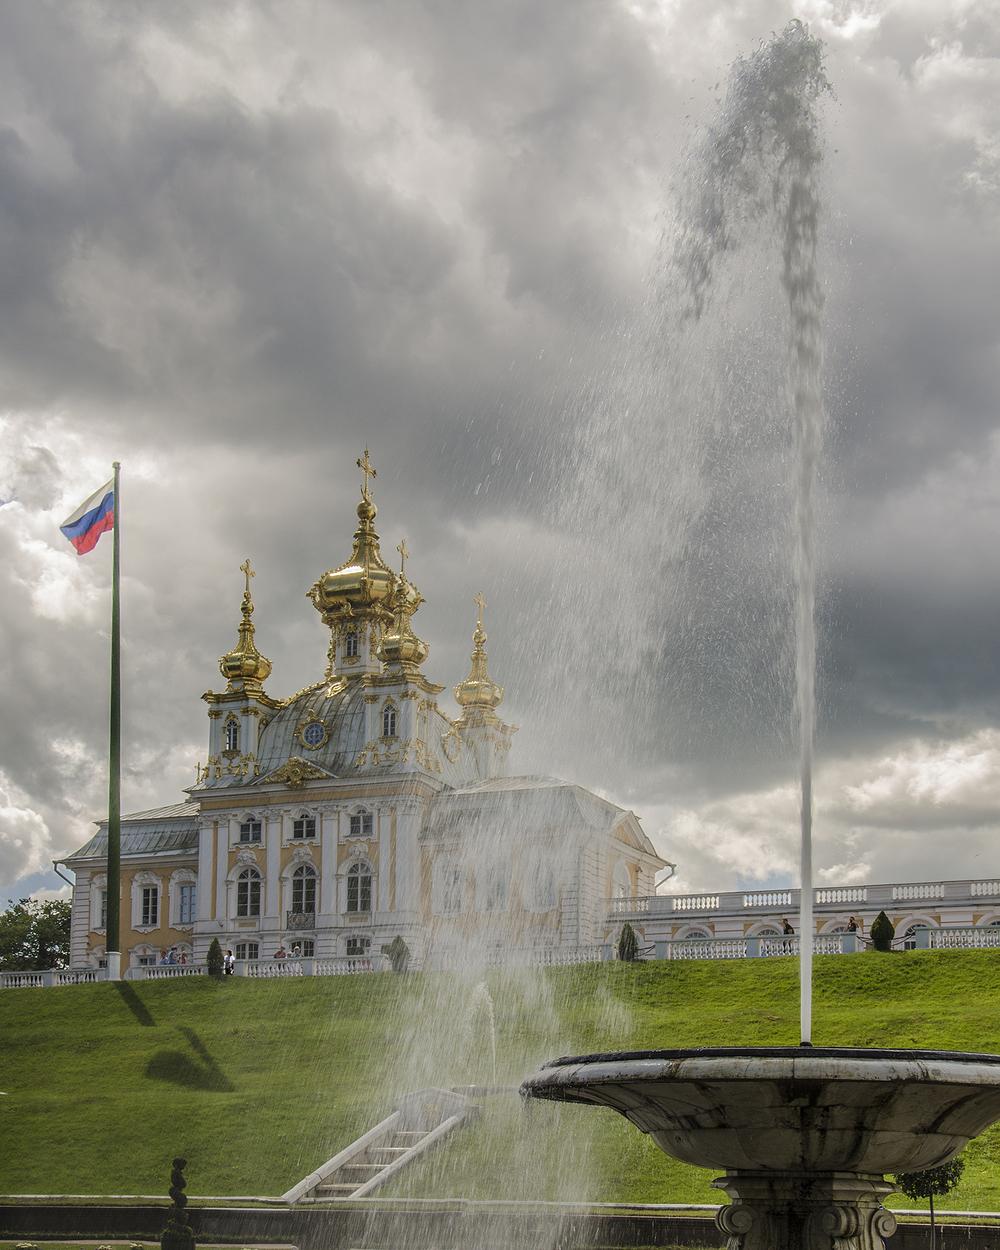 Petrodvorec-San Pietroburgo-8361.jpg